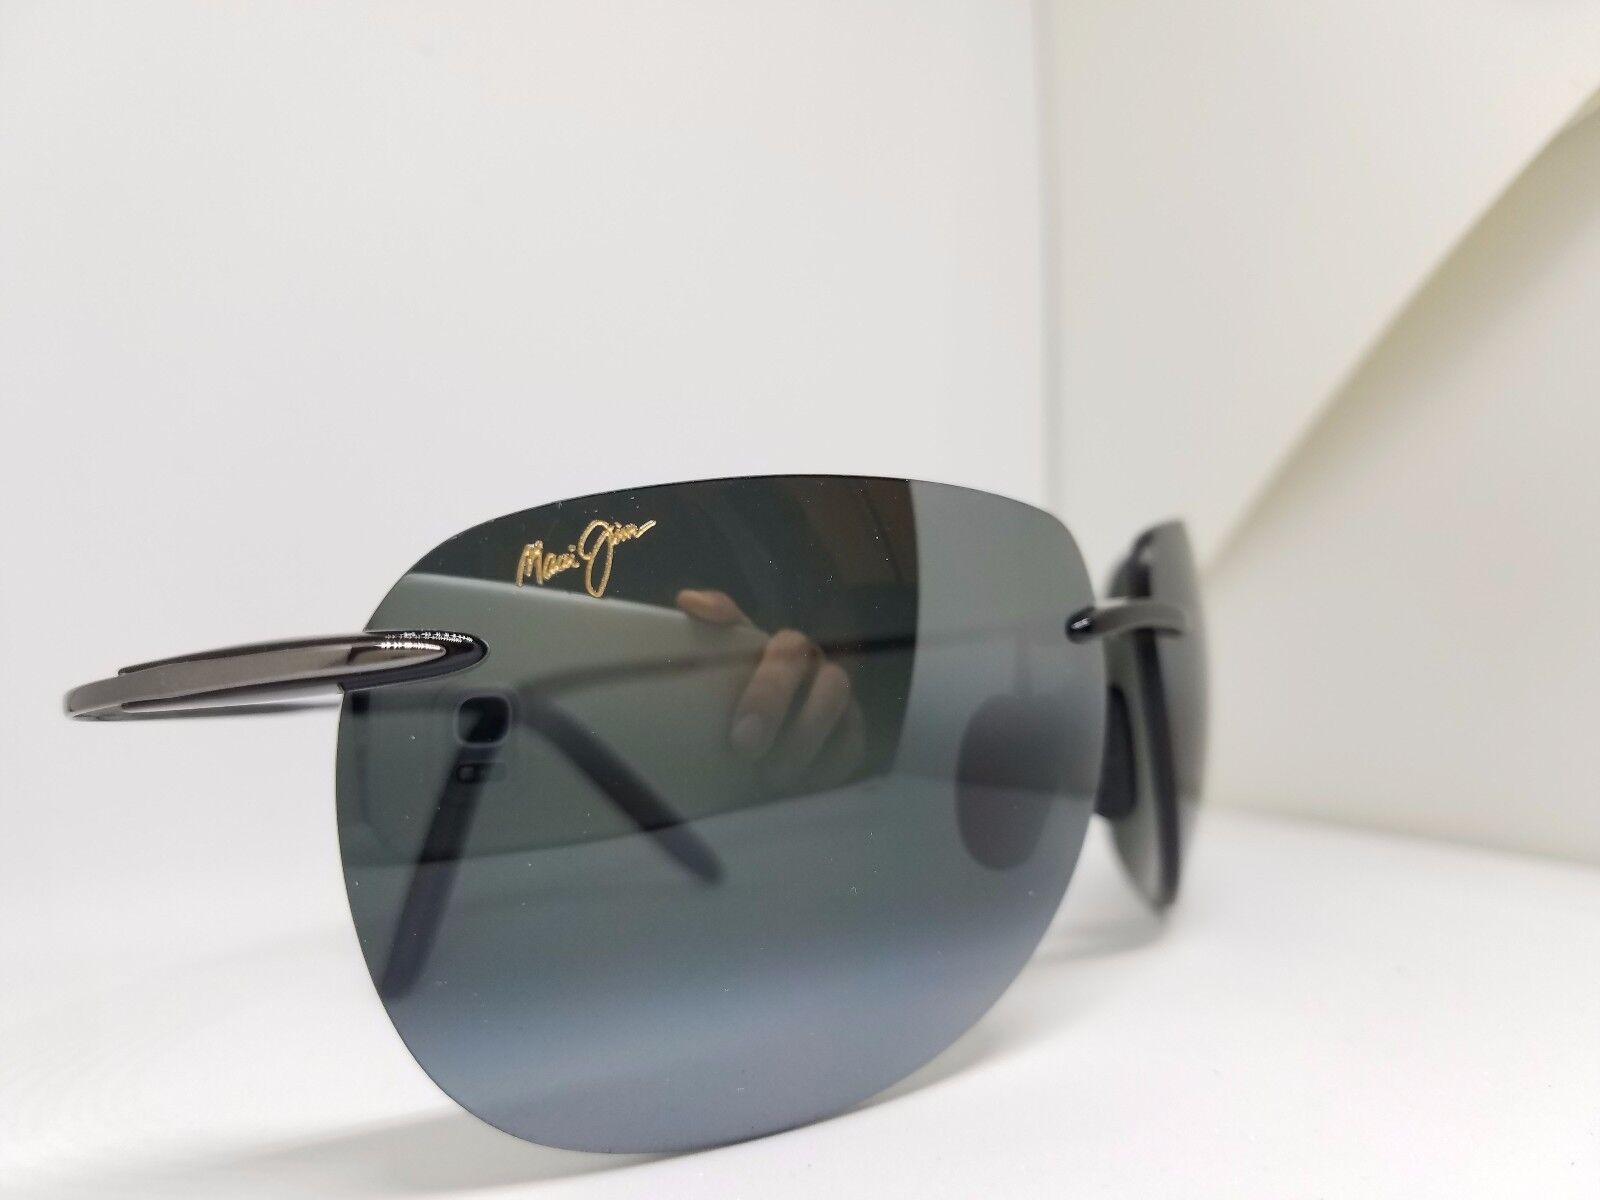 Maui Jim Unisex Nakalele Black/Gunmetal Sunglasses